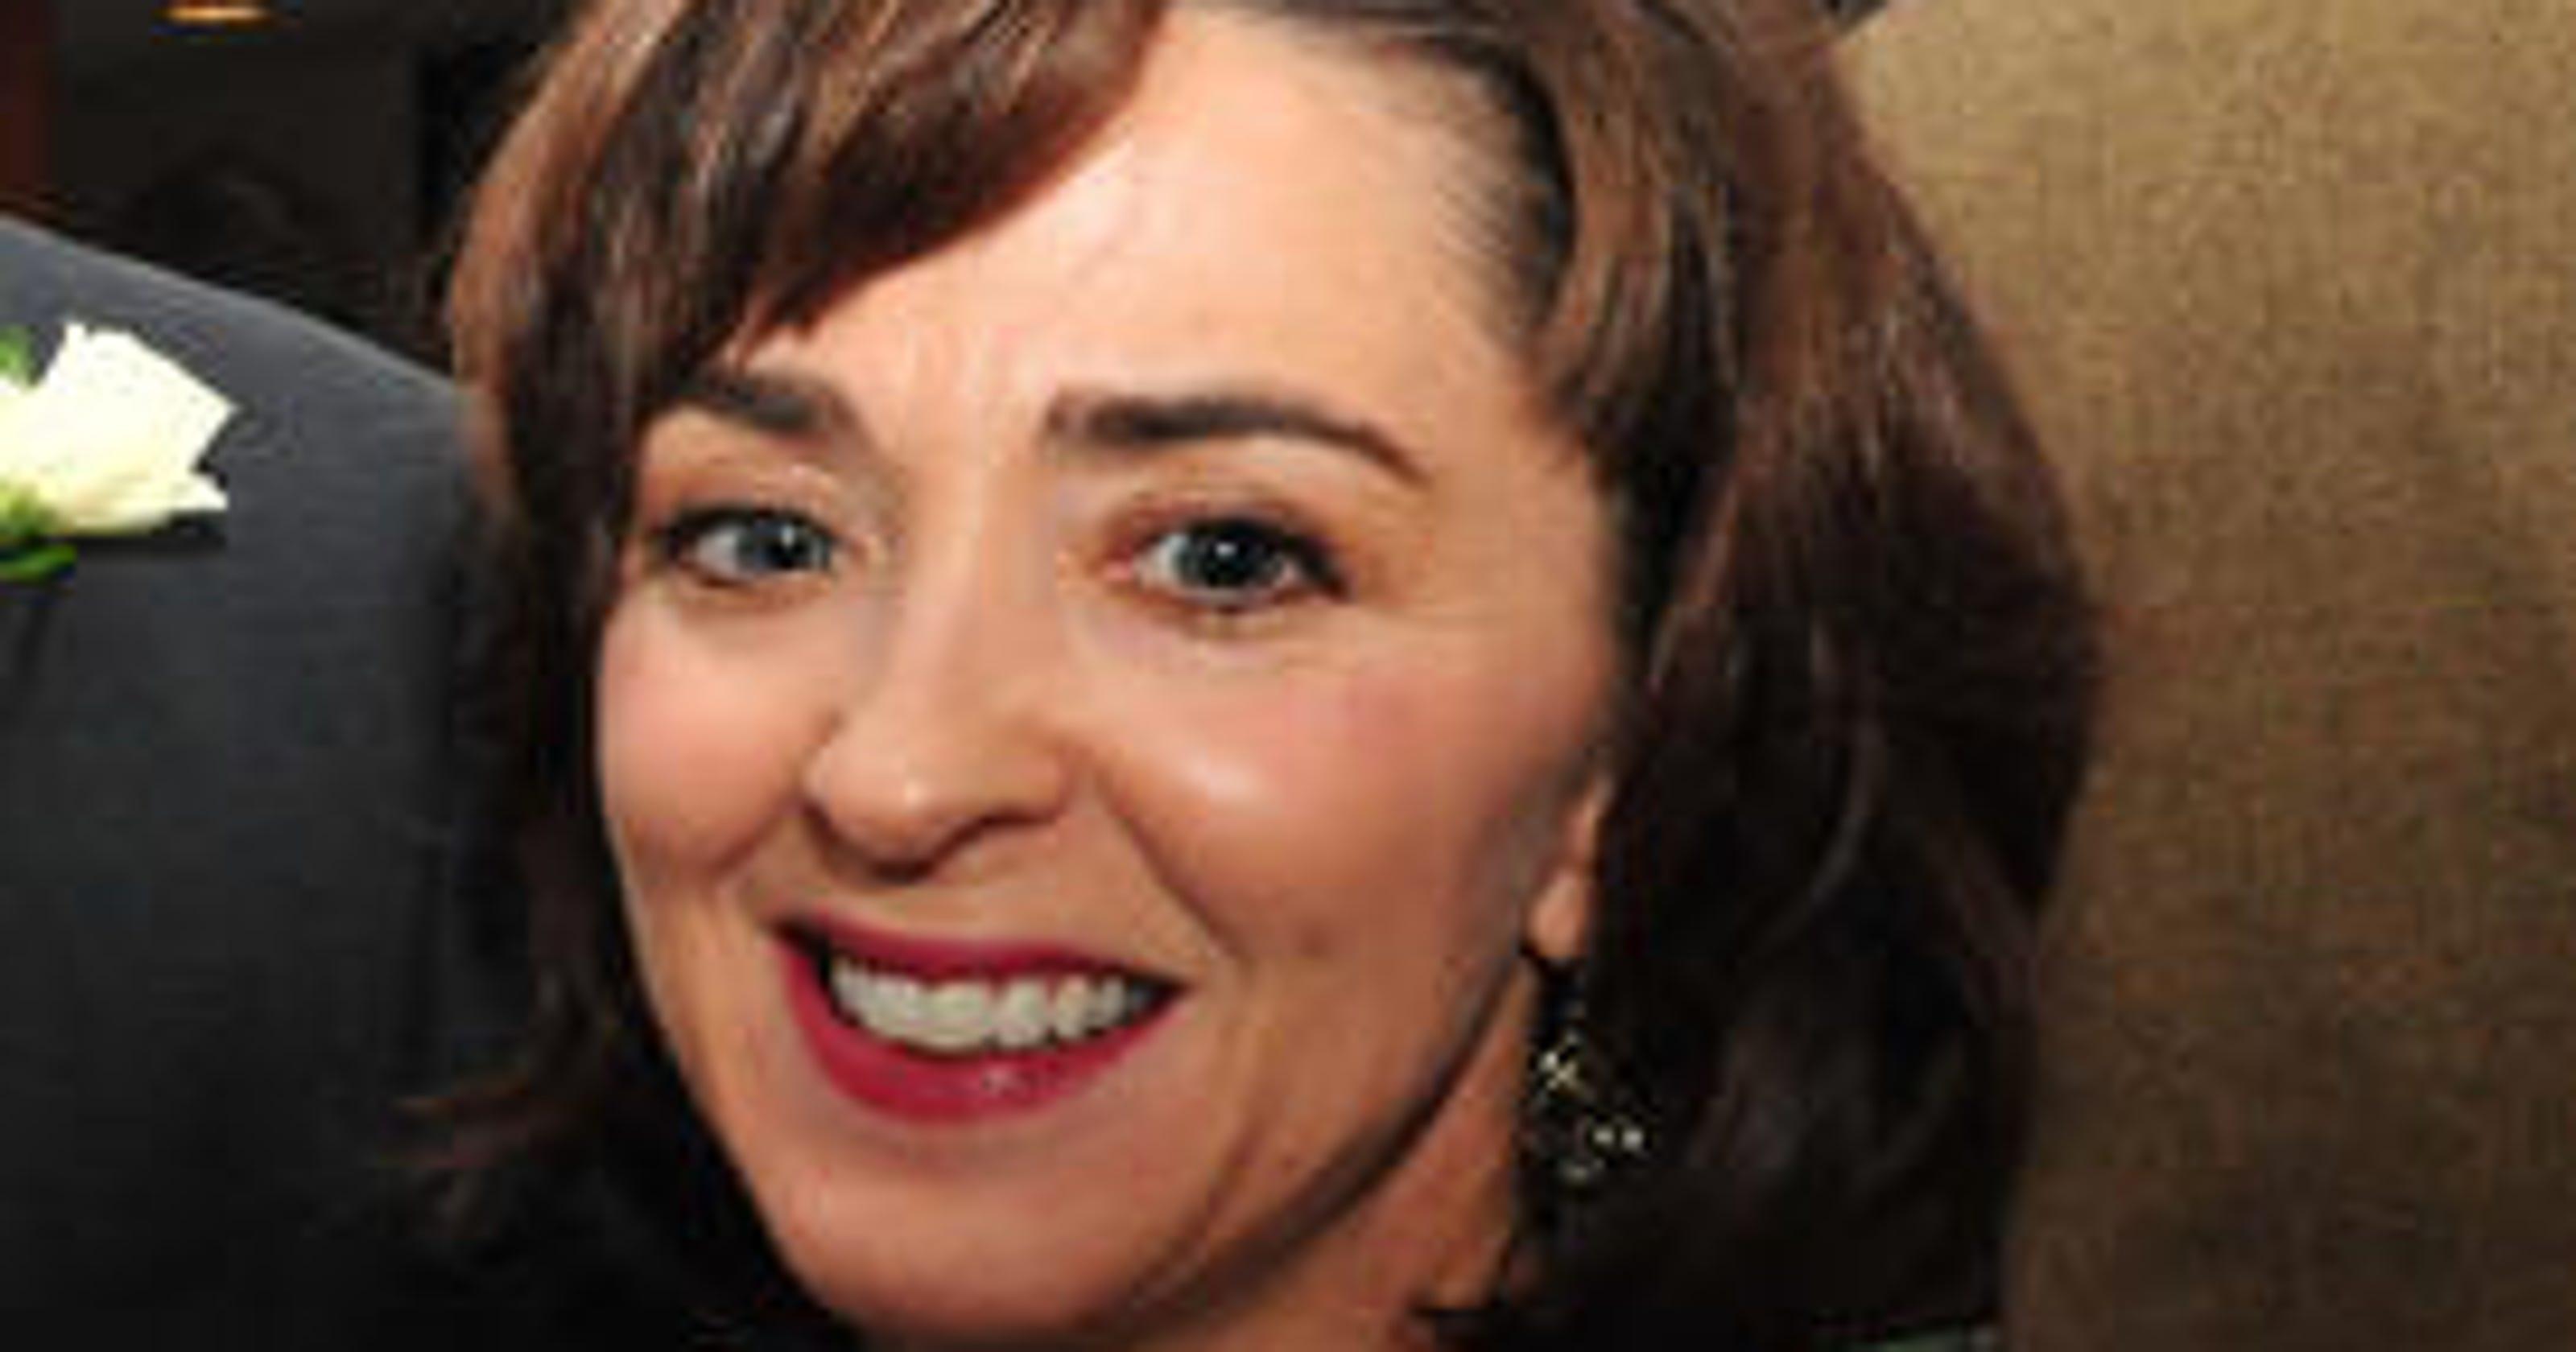 Judge Paula Price says 'no' to circuit court post